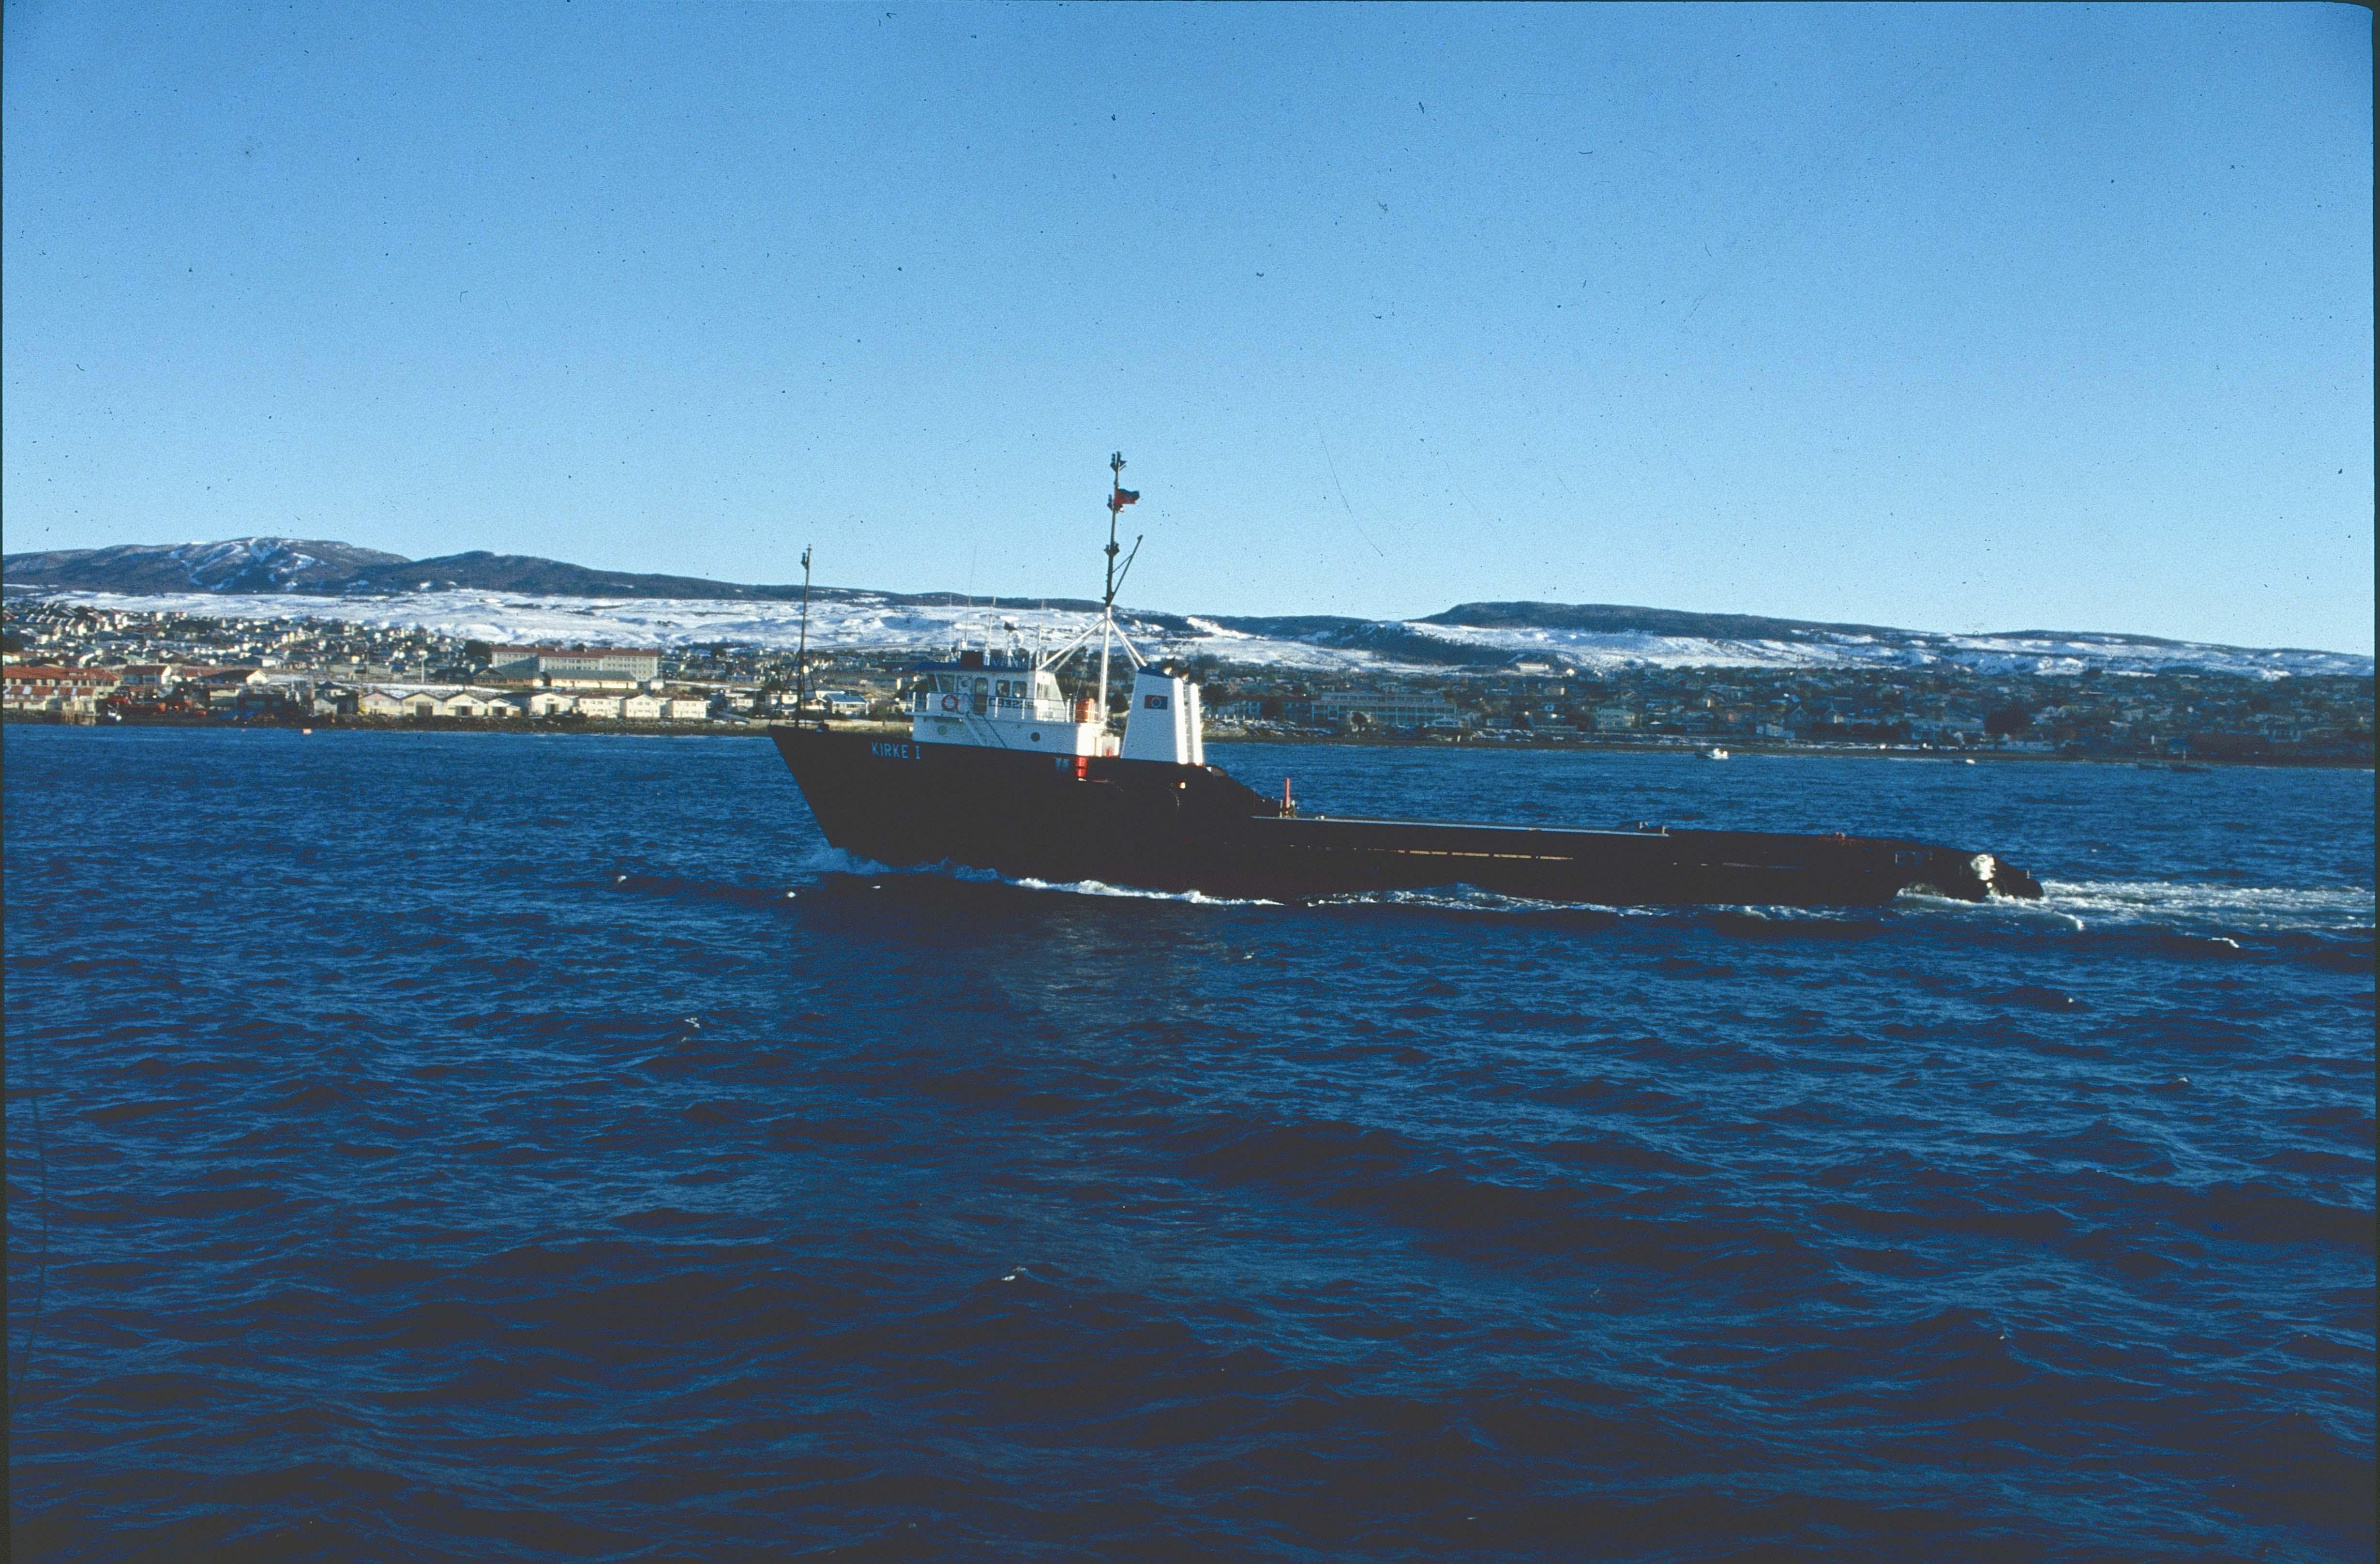 Enterreno - Fotos históricas de chile - fotos antiguas de Chile - Barco frente a Punta Arenas, 1990